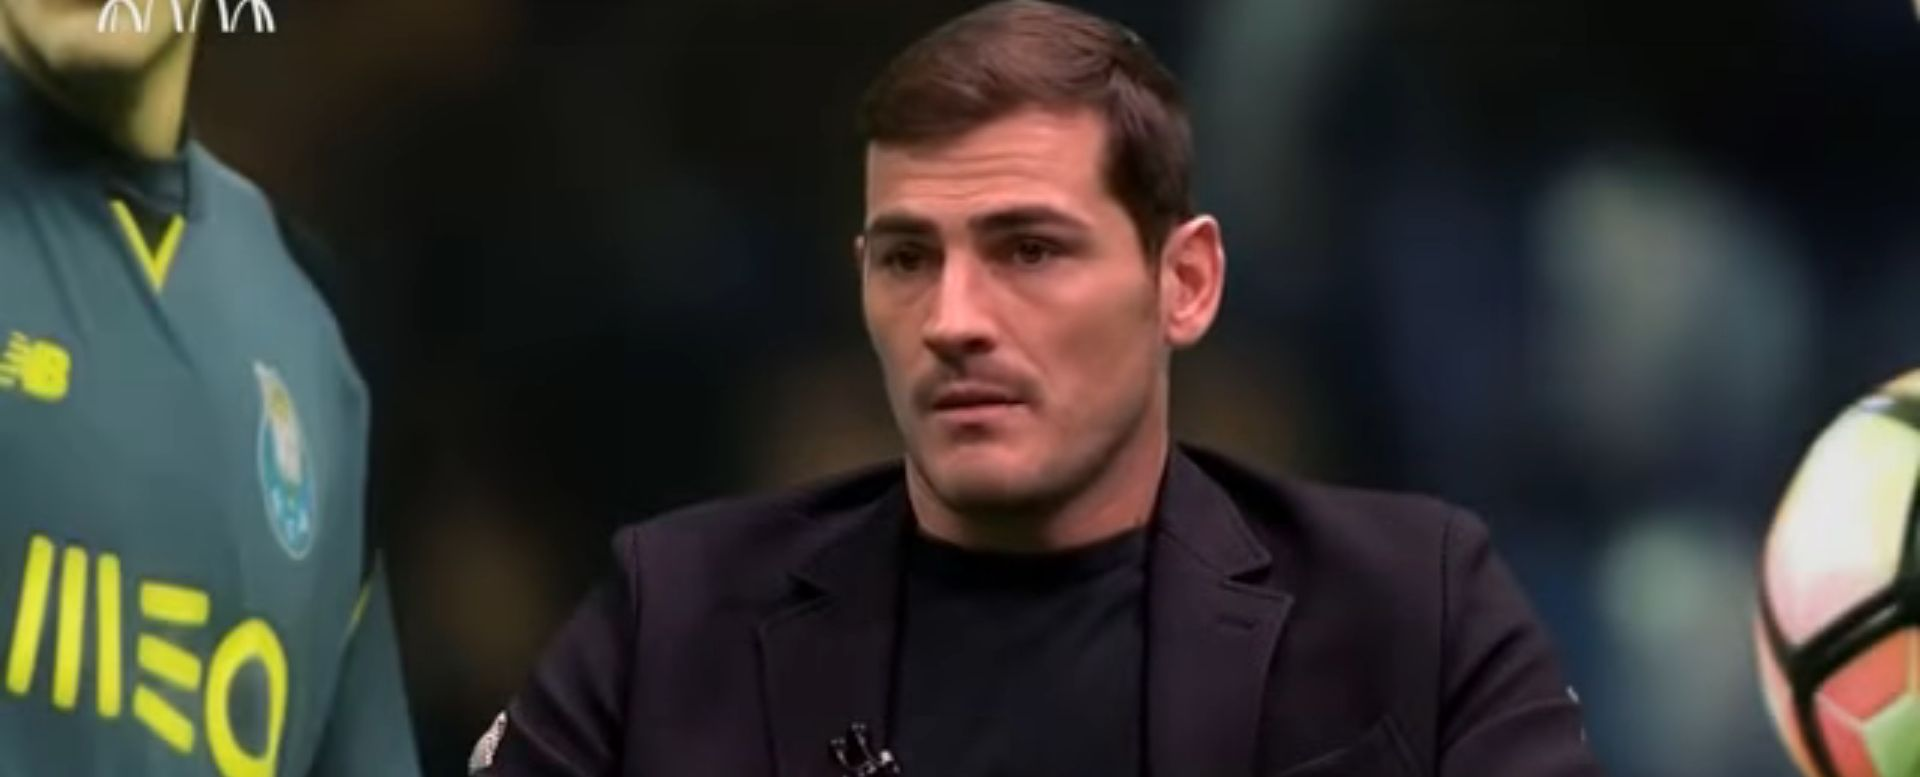 Iker Casillas nasmijan napustio bolnicu